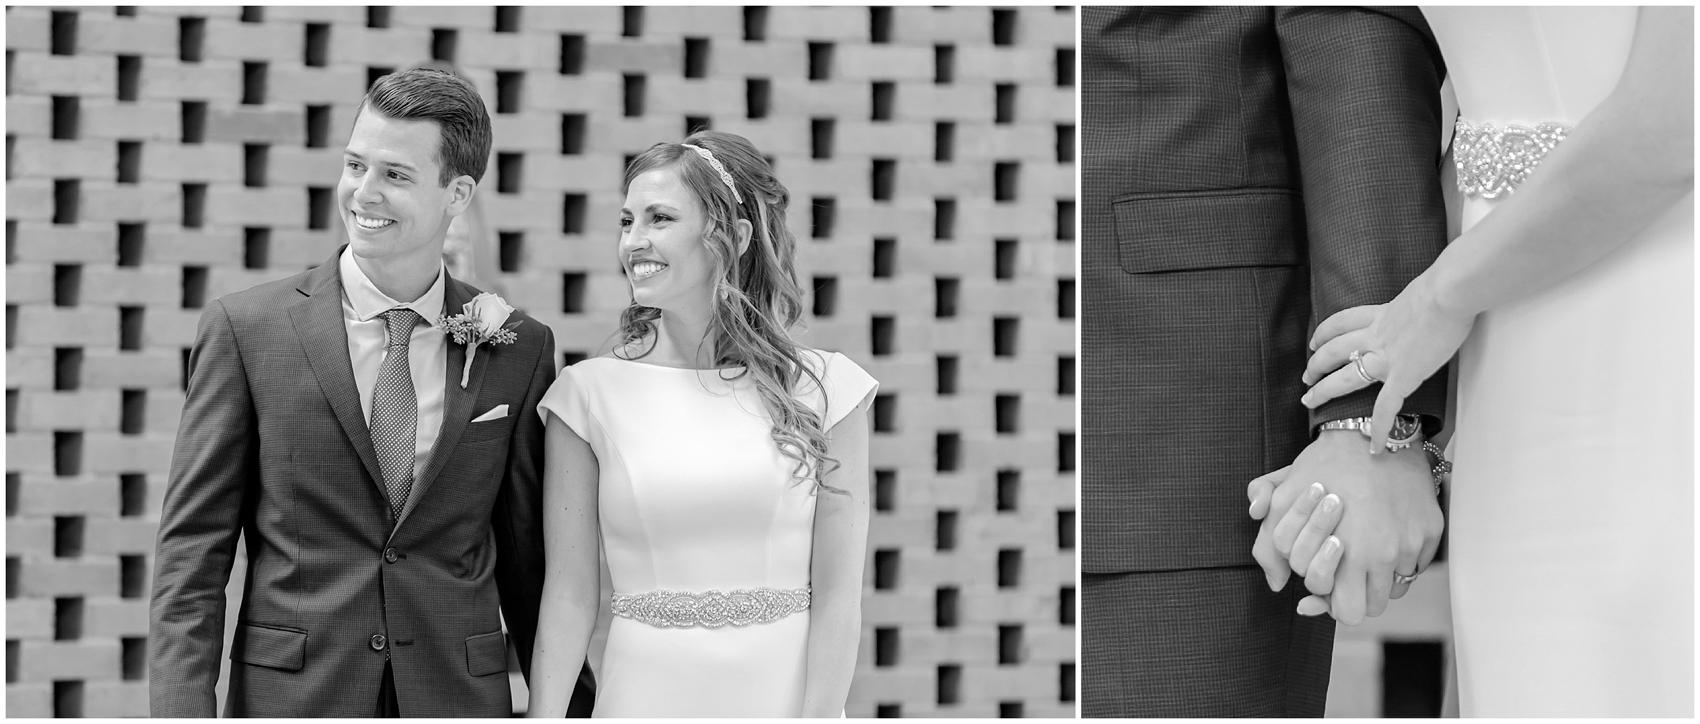 ritz-carlton-georgetown-wedding-washington-dc-photography-liz-stewart-photo-00017